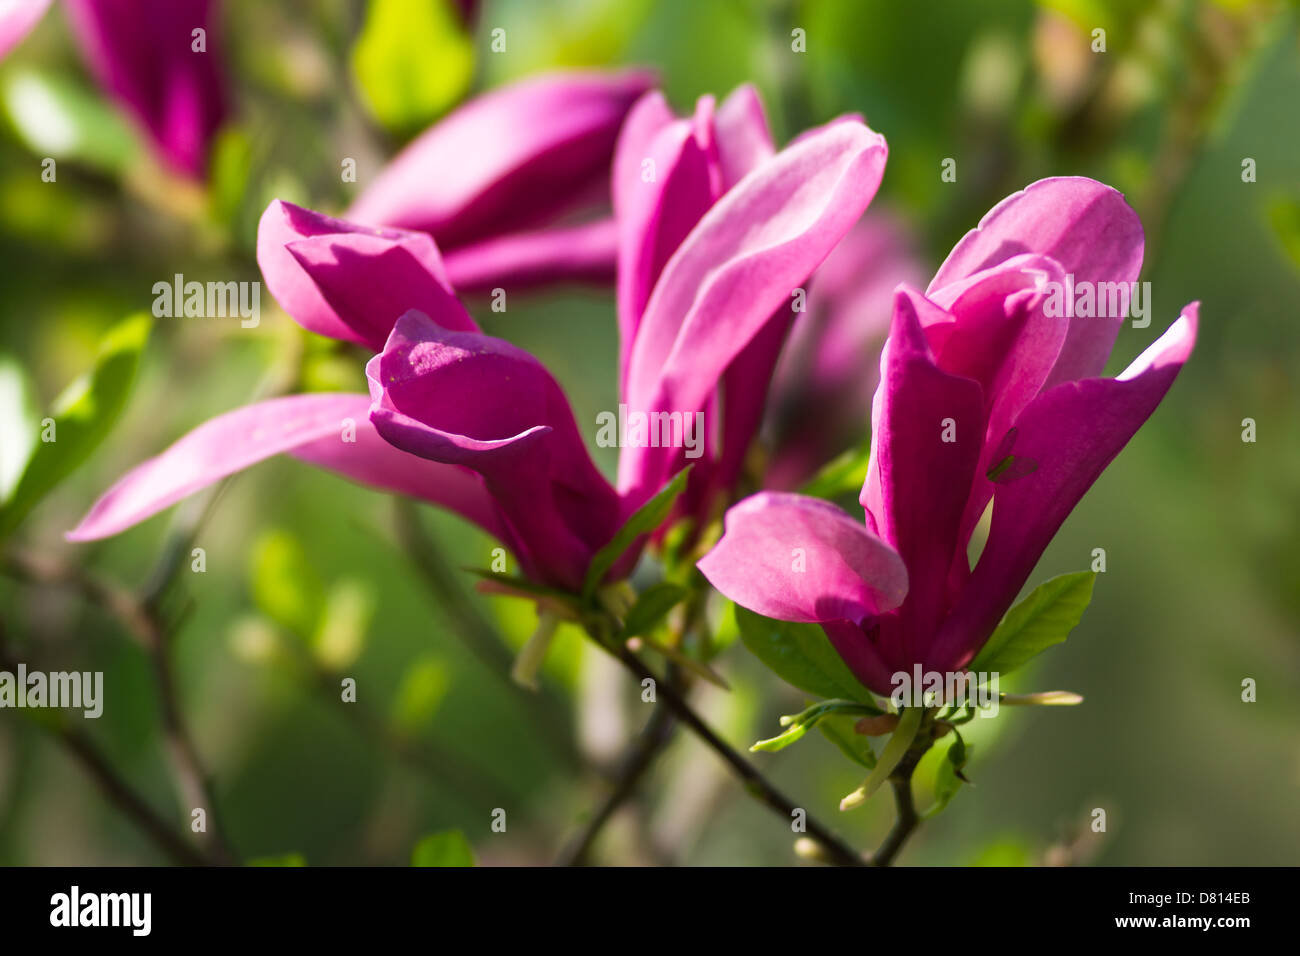 red magnolia flowers stock photo 56573843 alamy